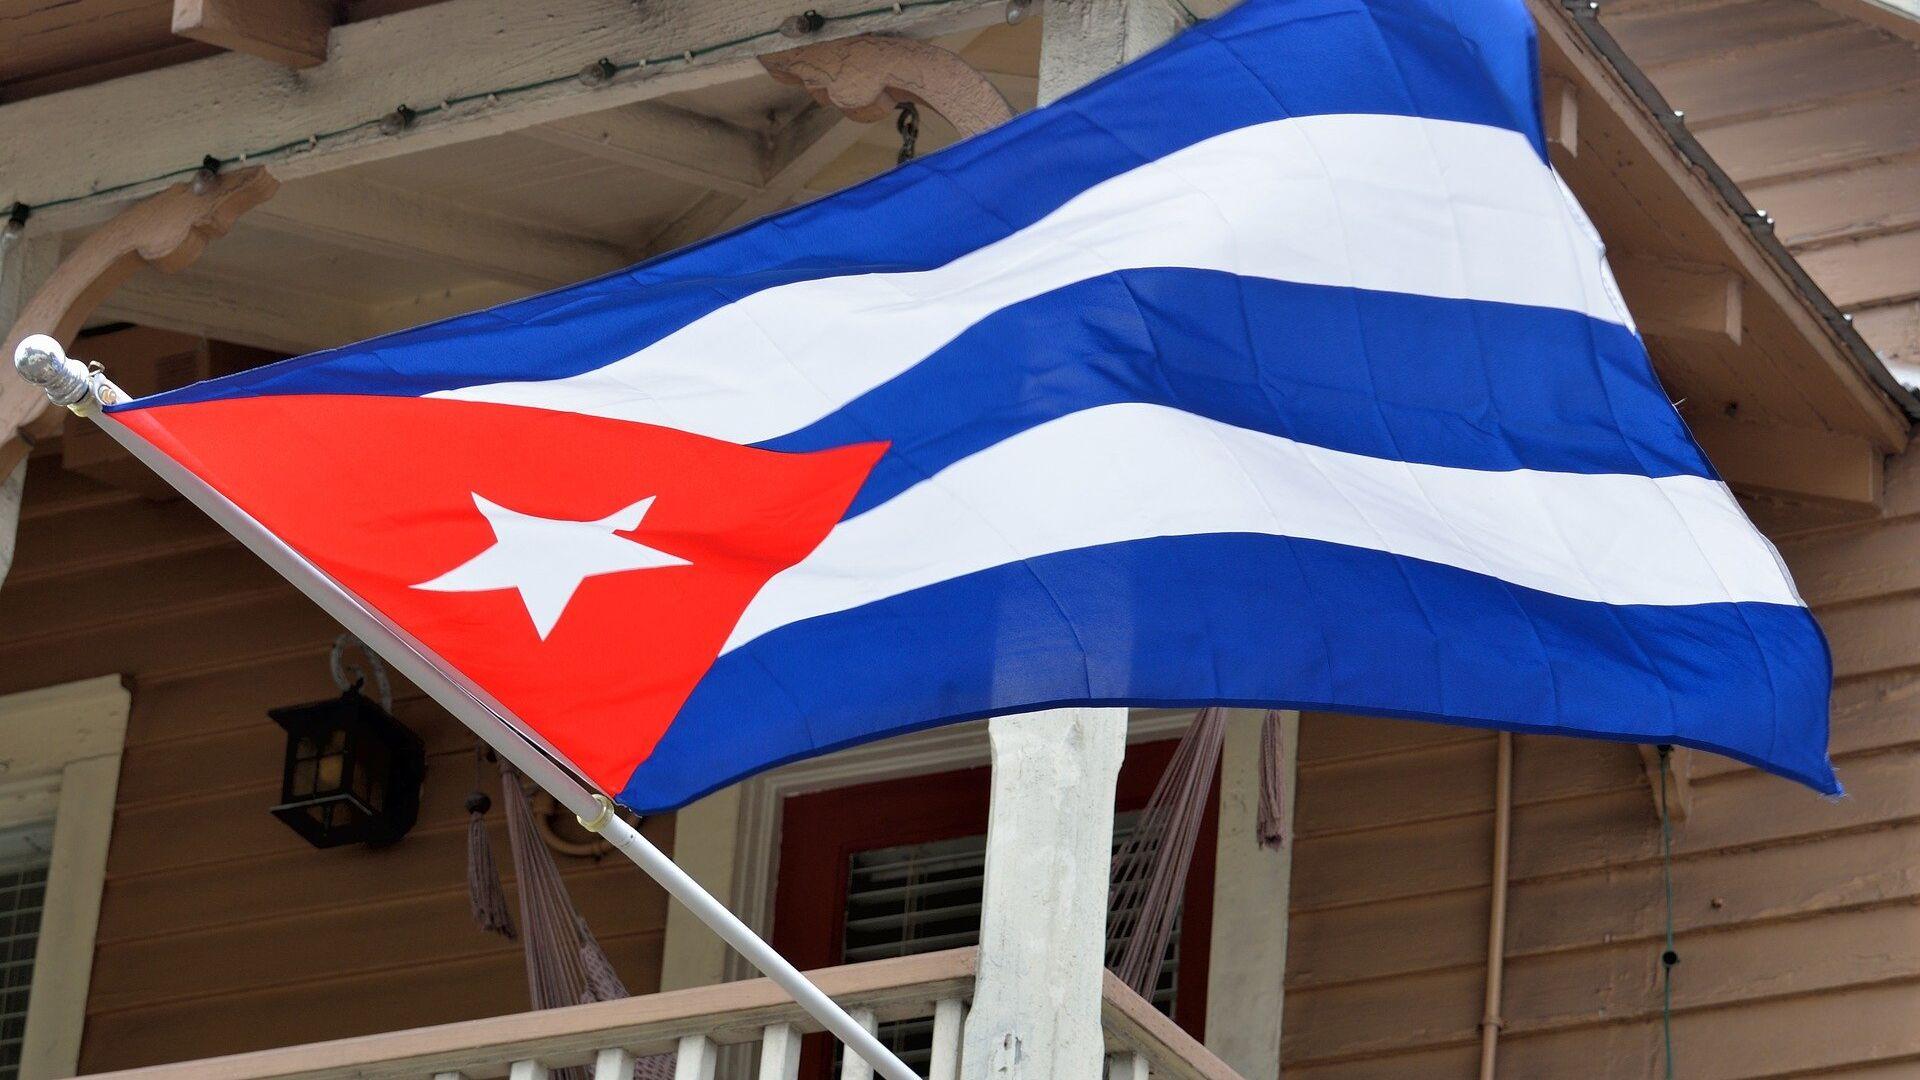 La bandera de Cuba - Sputnik Mundo, 1920, 24.07.2021